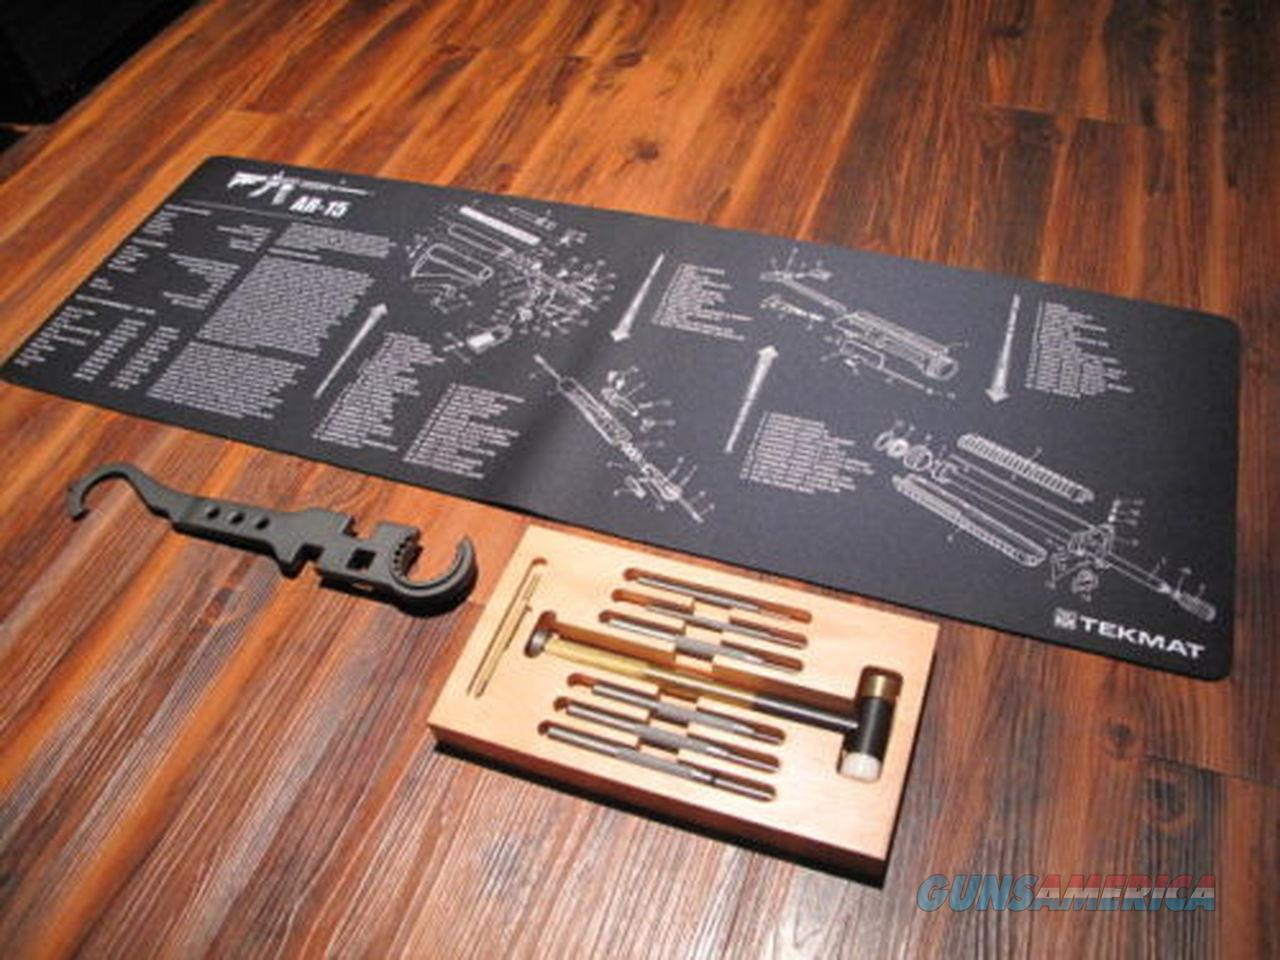 Rifle Builder ELITE KIT Wrench Cleaning Mat TEKMAT Punch Kit Armorers .223  Non-Guns > Ammunition